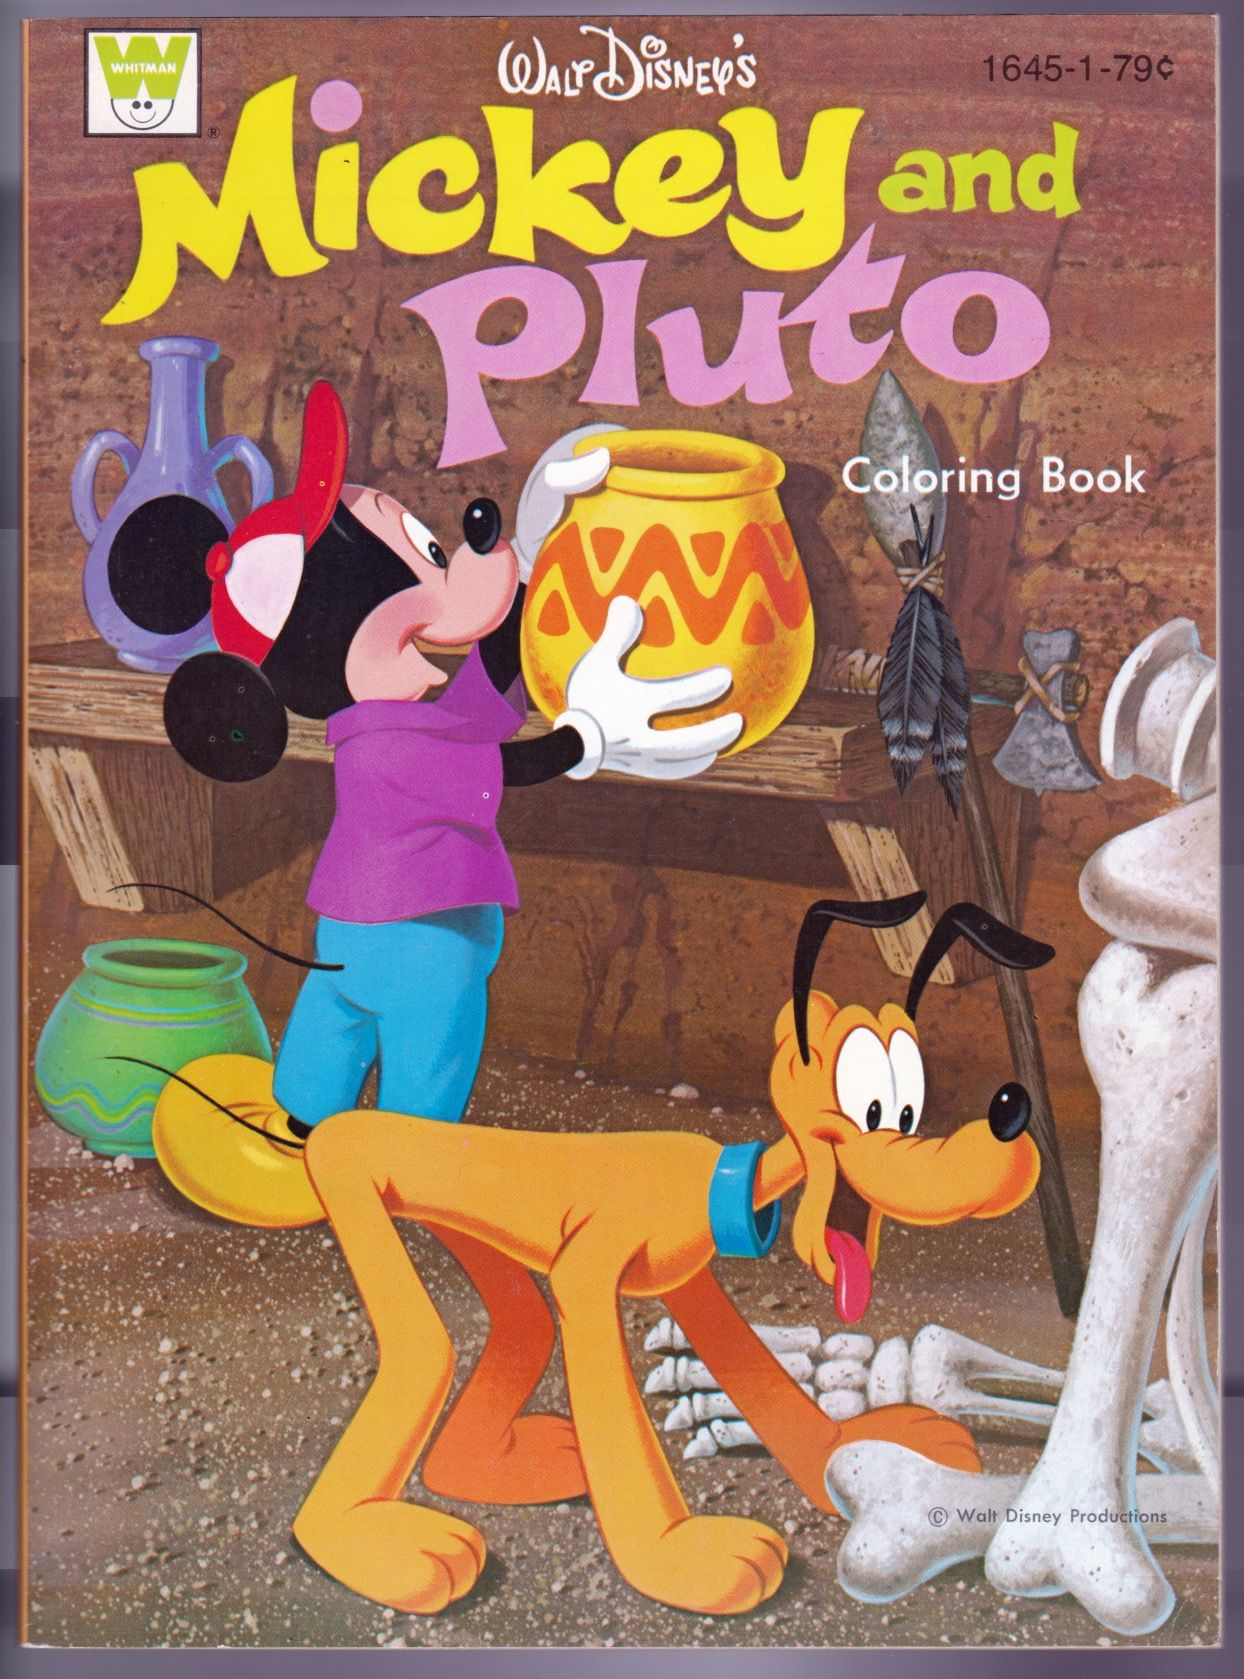 Walt Disneys Mickey And Pluto Coloring Book Whitman Publishing 1972 From Disneyland Treasures Ebay Store